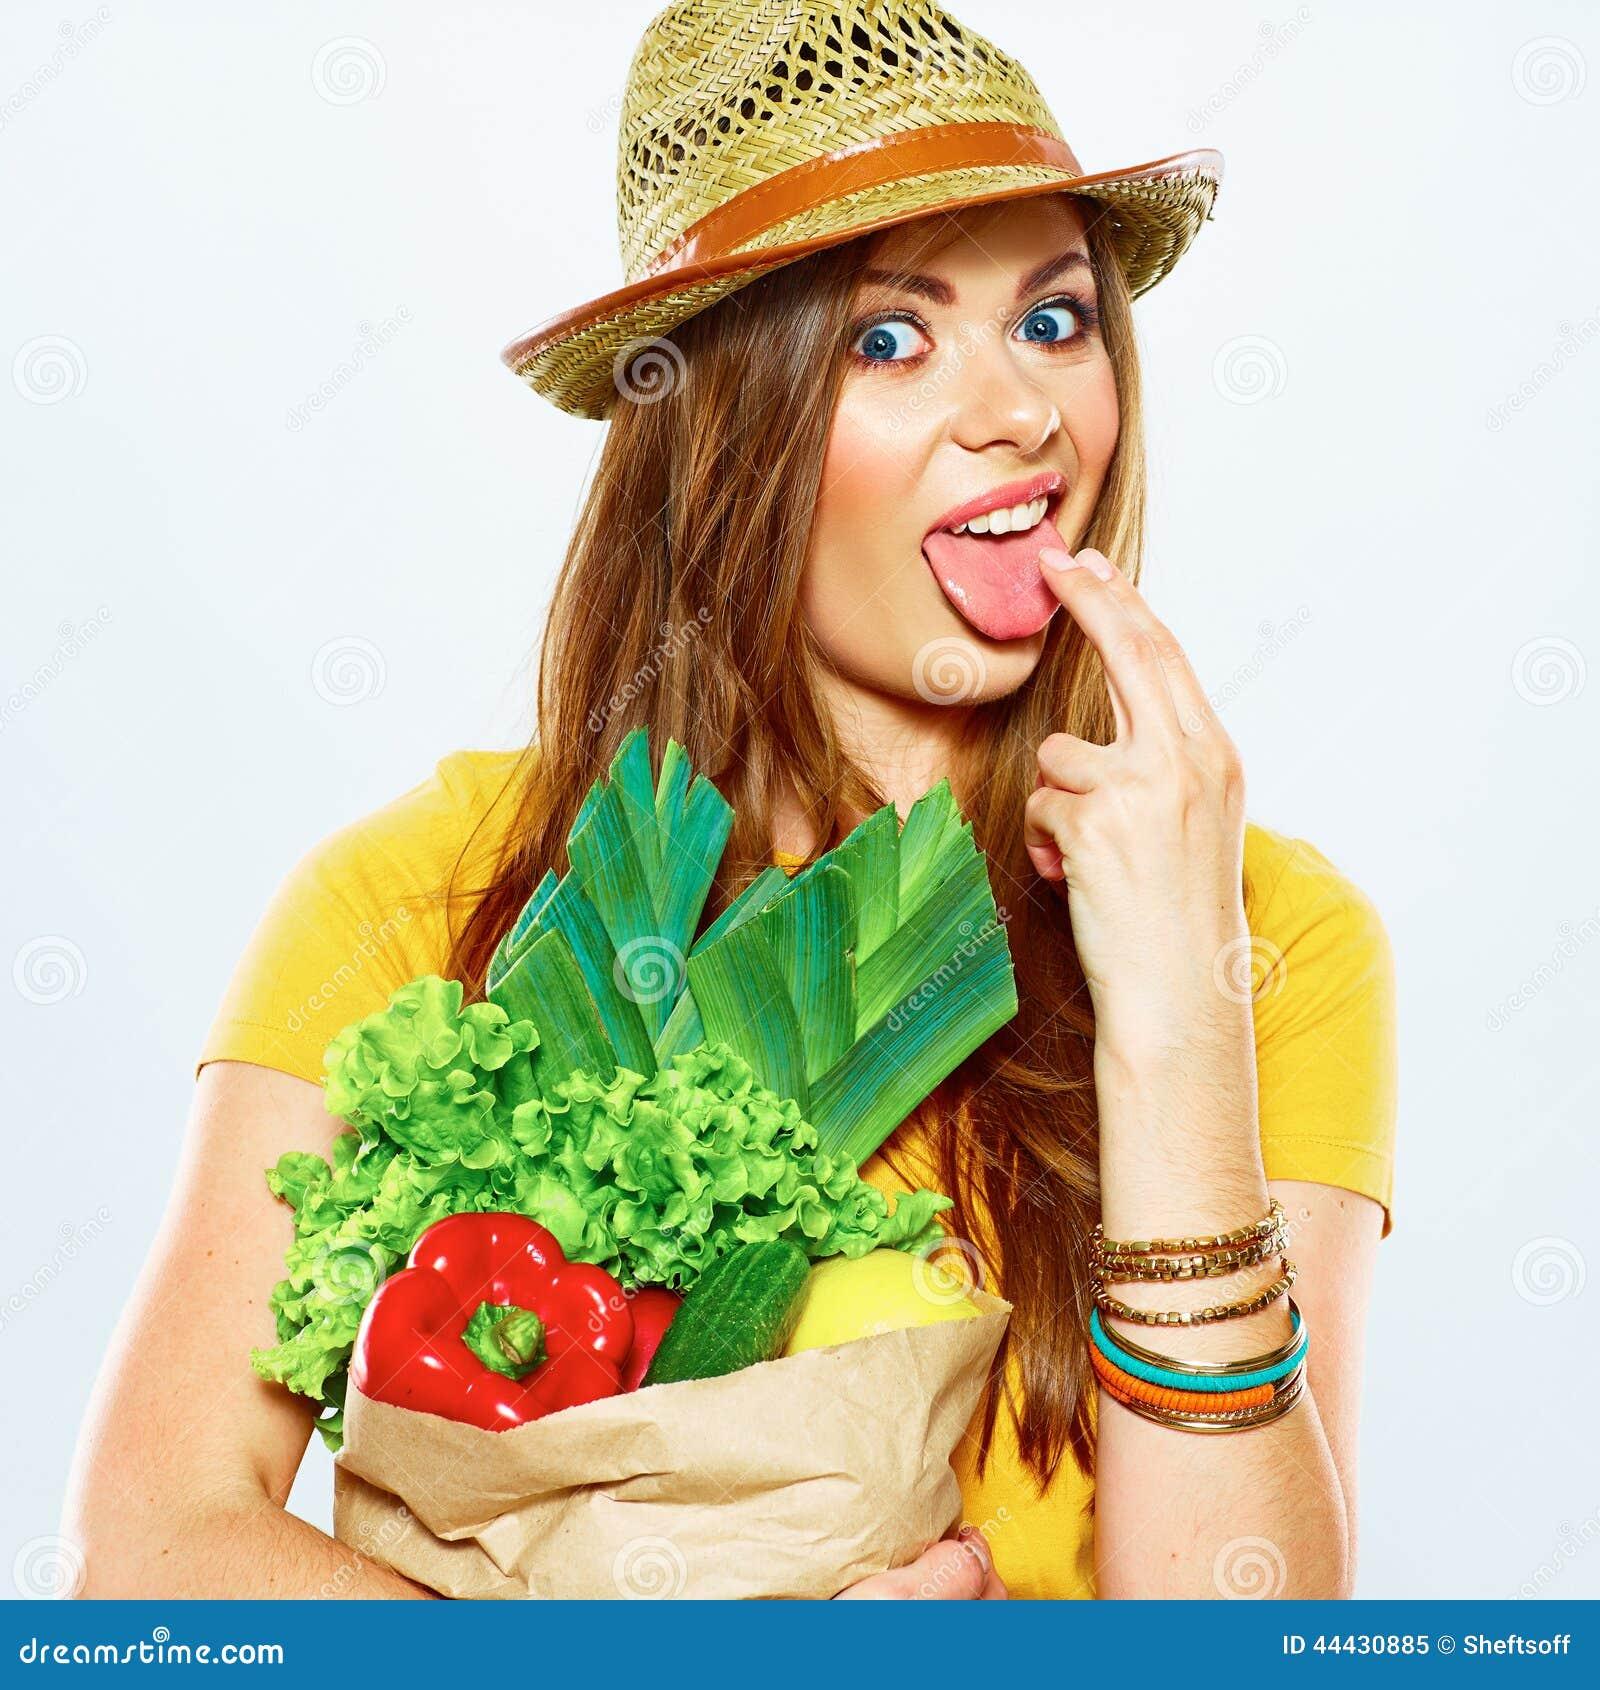 Beliefs and Attitudes toward Vegetarian Lifestyle across Generations